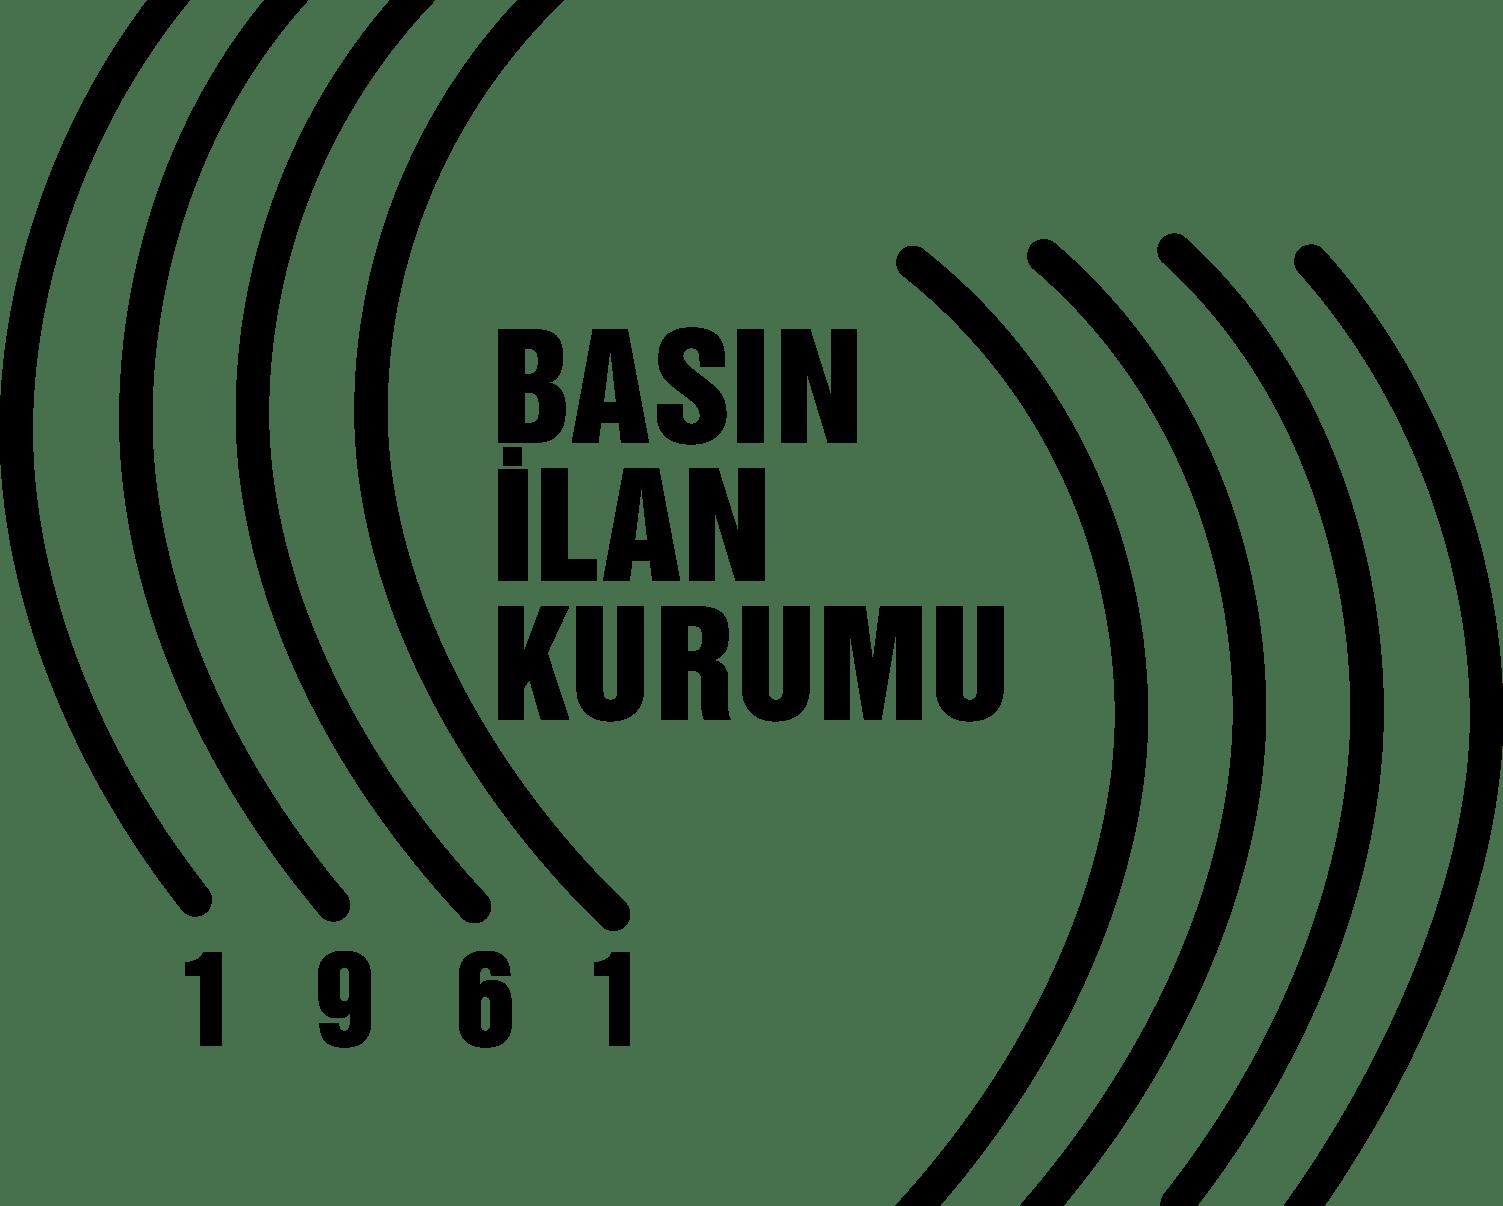 Basın İlan Kurumu Logosu [bik.gov.tr] png